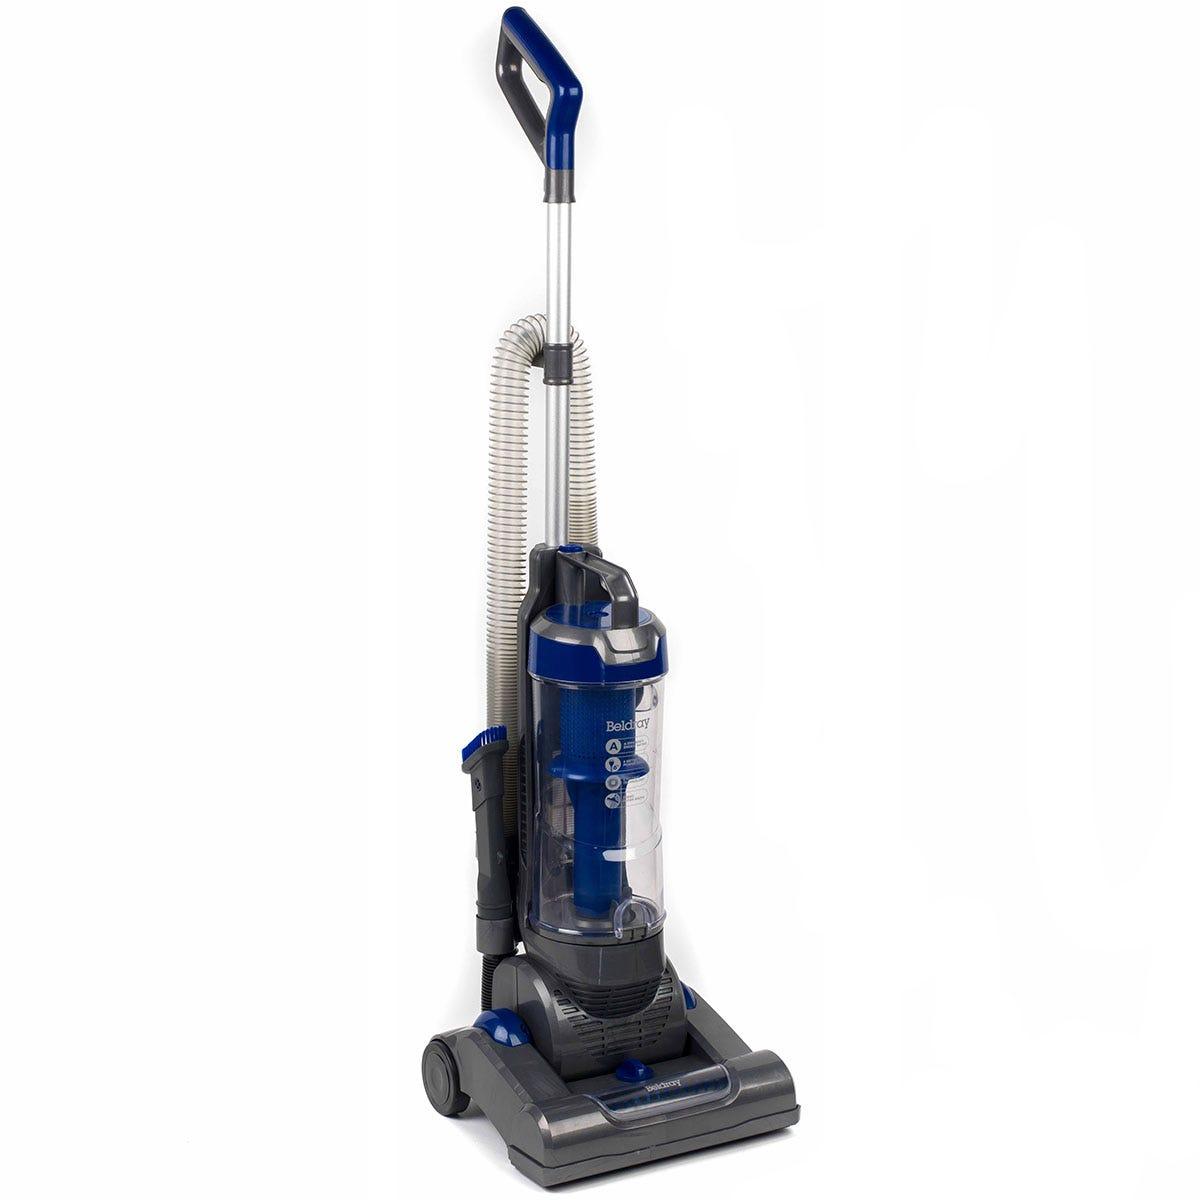 Image of Beldray Air Power 2.5L Upright Vacuum Floor Cleaner - Black